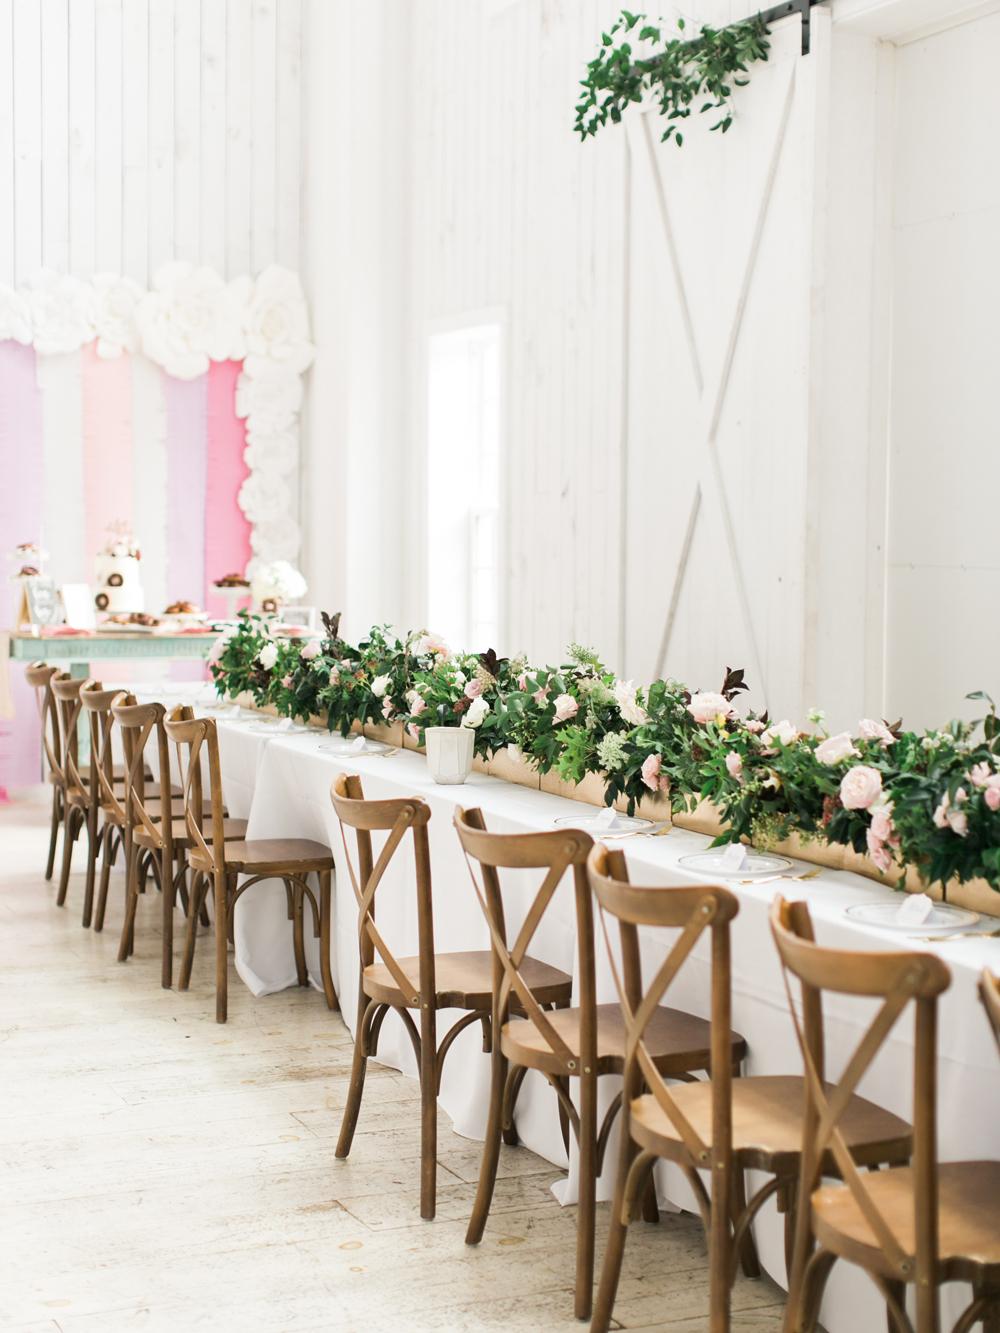 romantic wedding tables - photo by Elisabeth Carol Photography http://ruffledblog.com/picturesque-garden-wedding-at-white-sparrow-barn